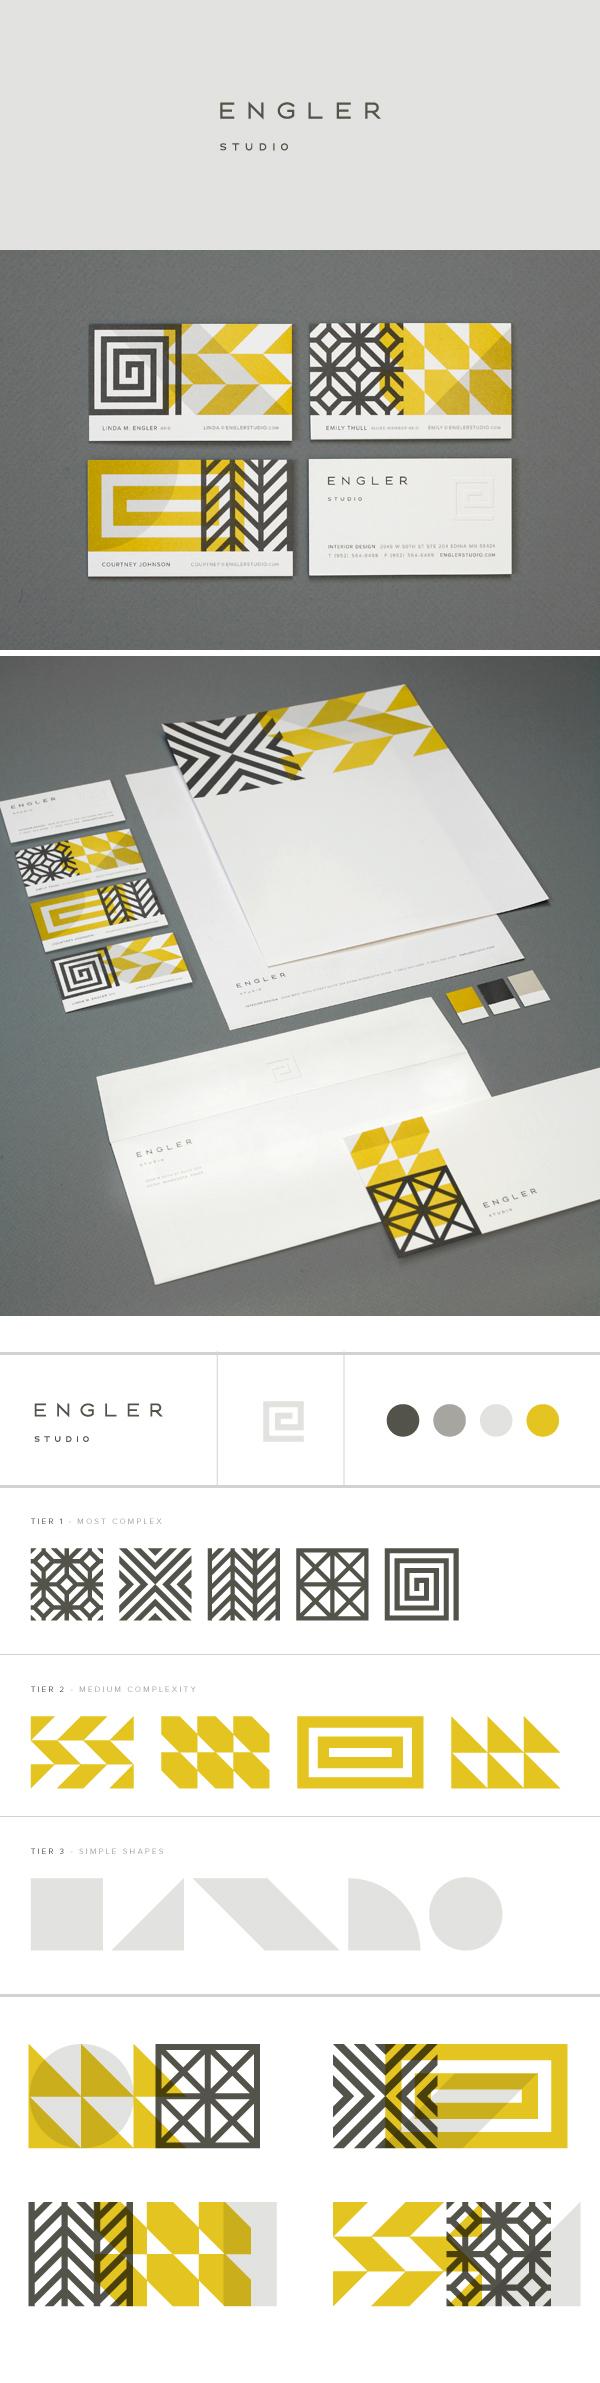 ENGLER_IDENTIDAD_Engler Studio